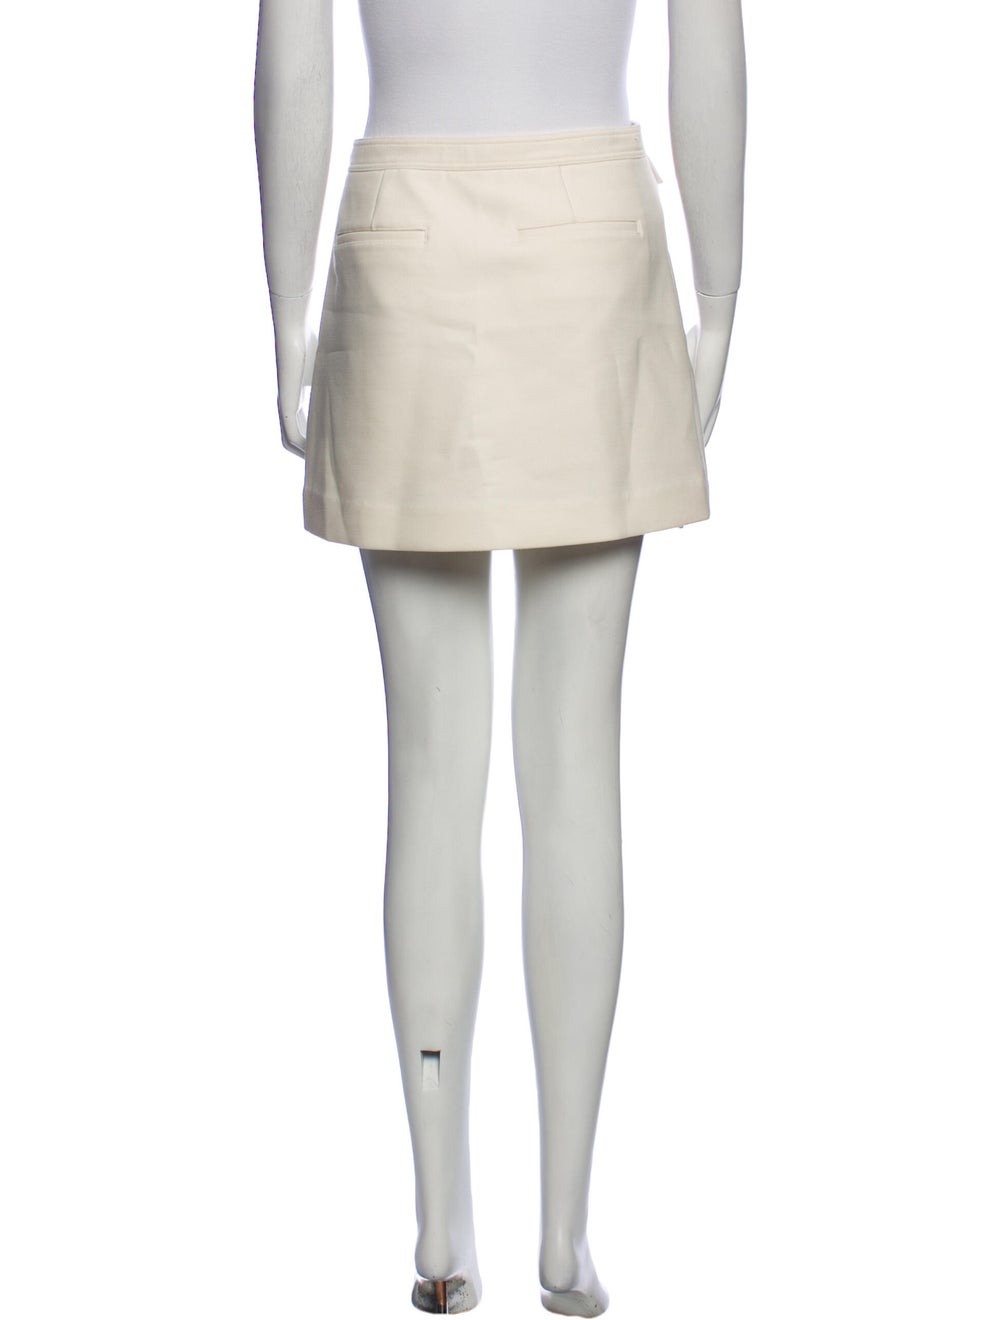 Theory Mini Skirt - image 3